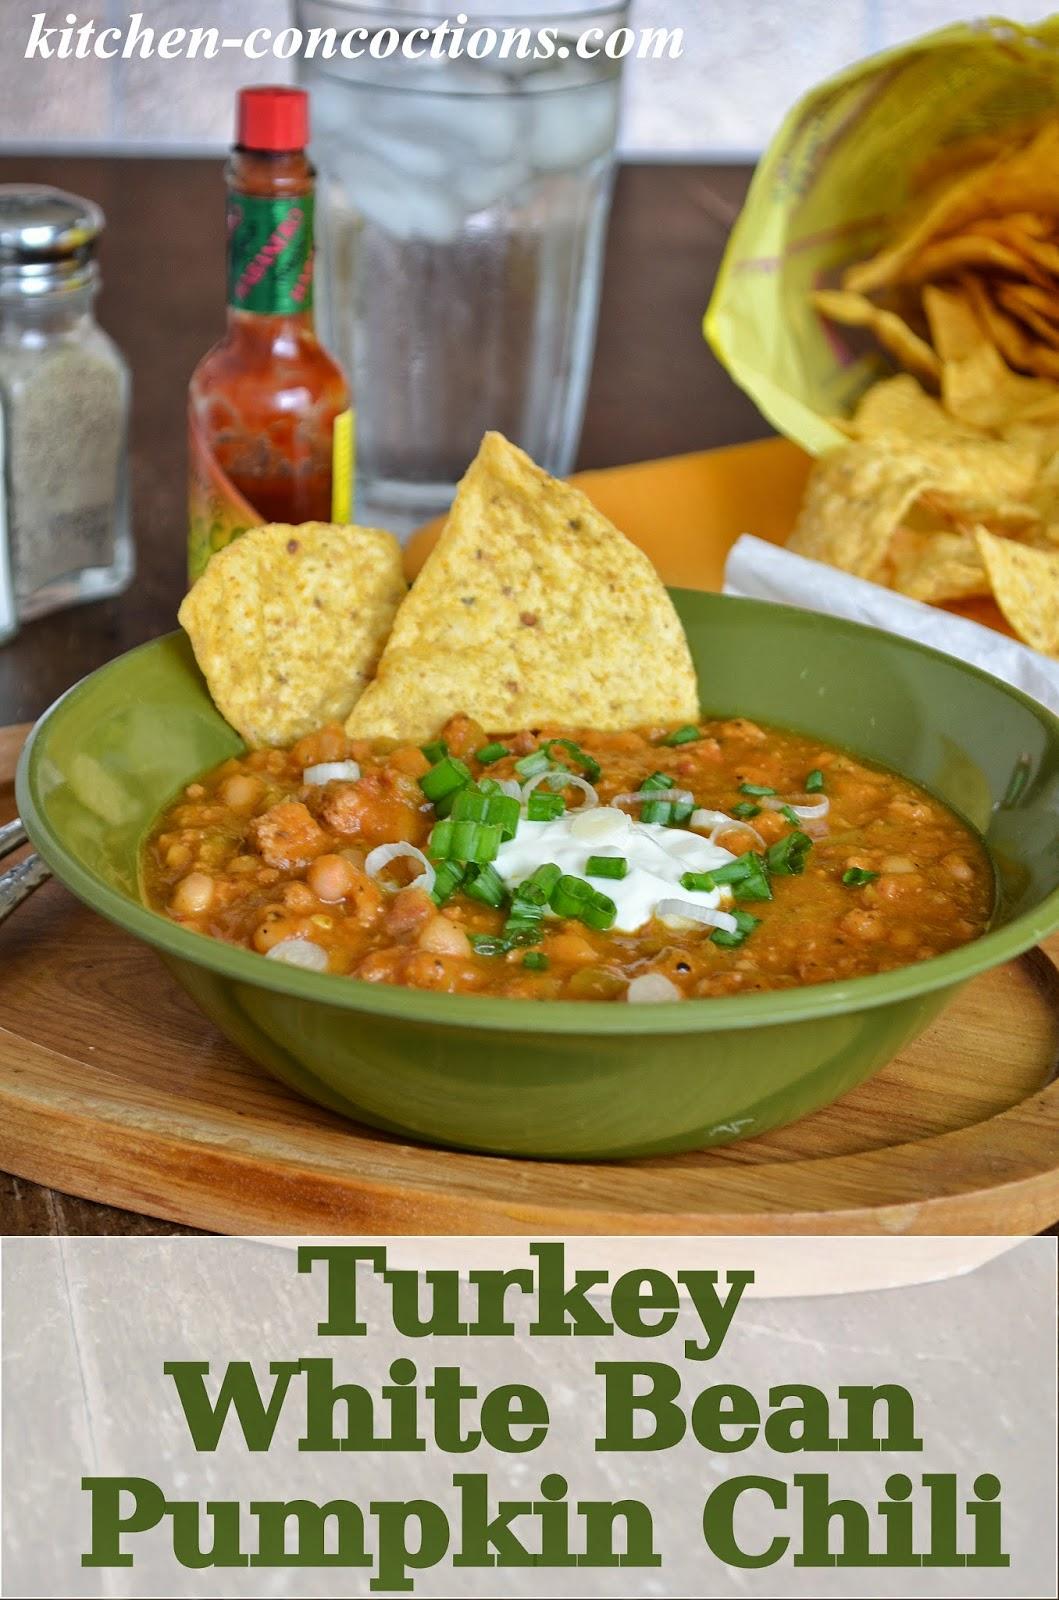 Kitchen Concoctions: Crock-Pot Turkey White Bean Pumpkin Chili